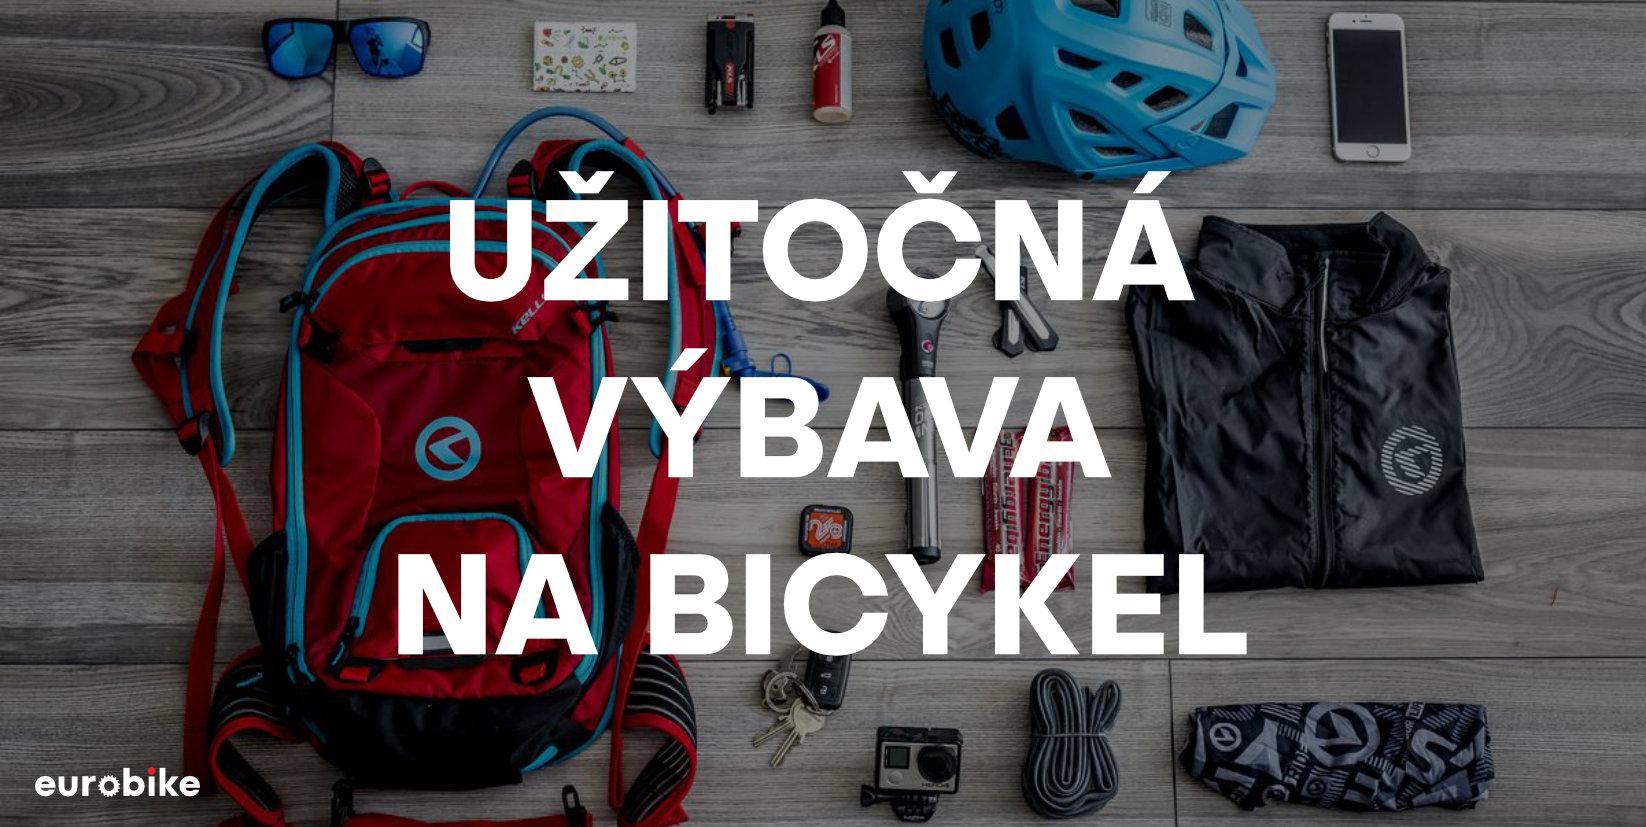 Užitočná výbava na bicykel